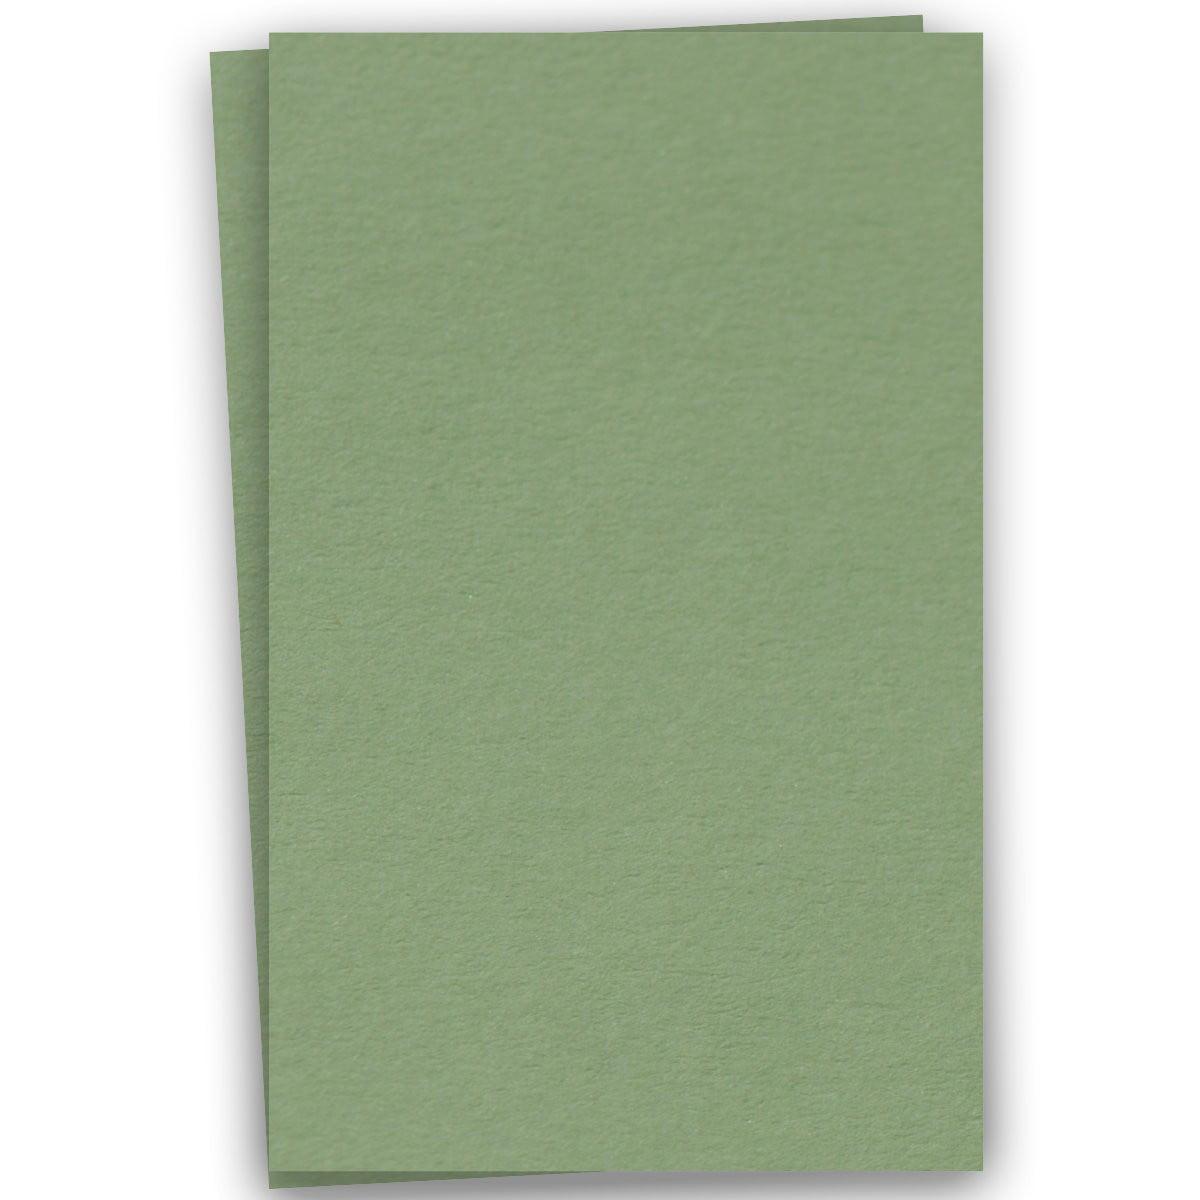 basics olive 12x18 paper 80c cardstock  100 pk  quality